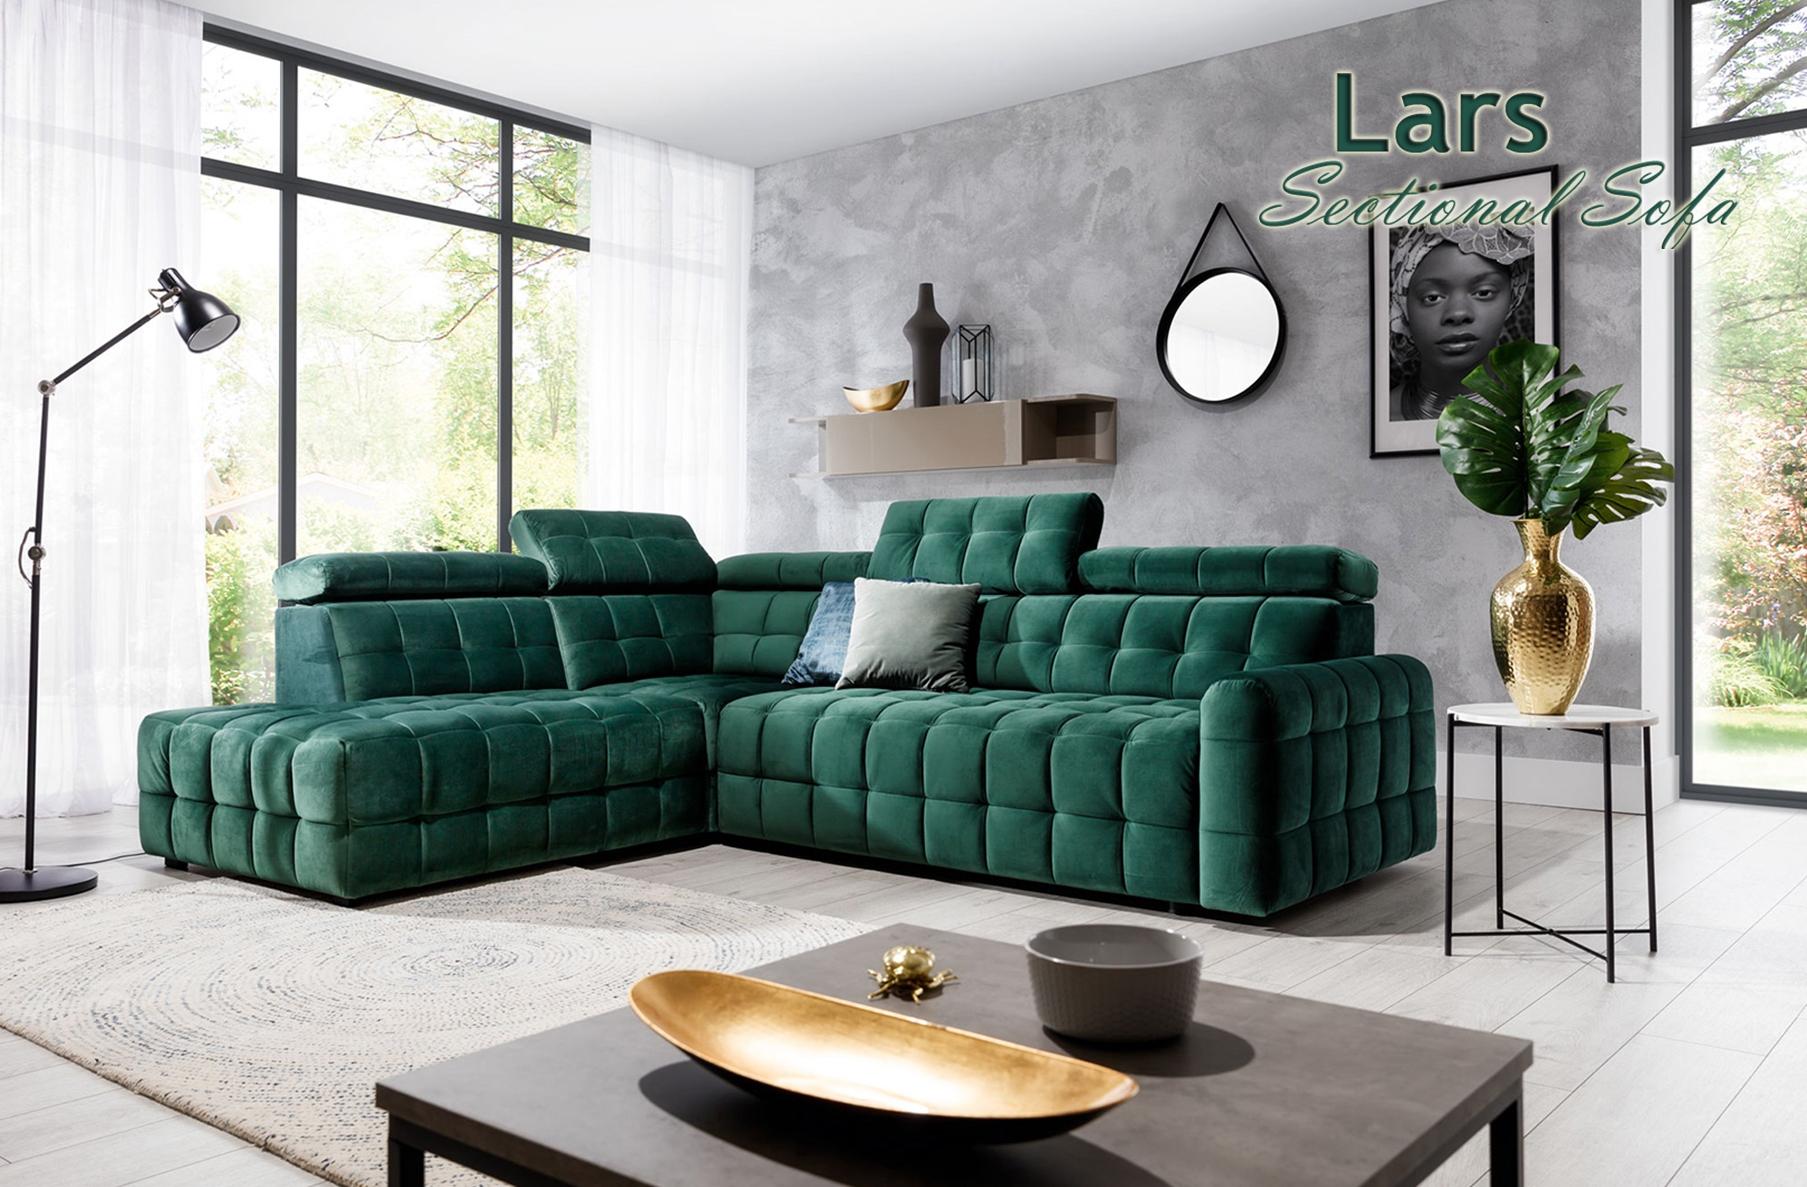 Lars Sectional Sofa, Cheap